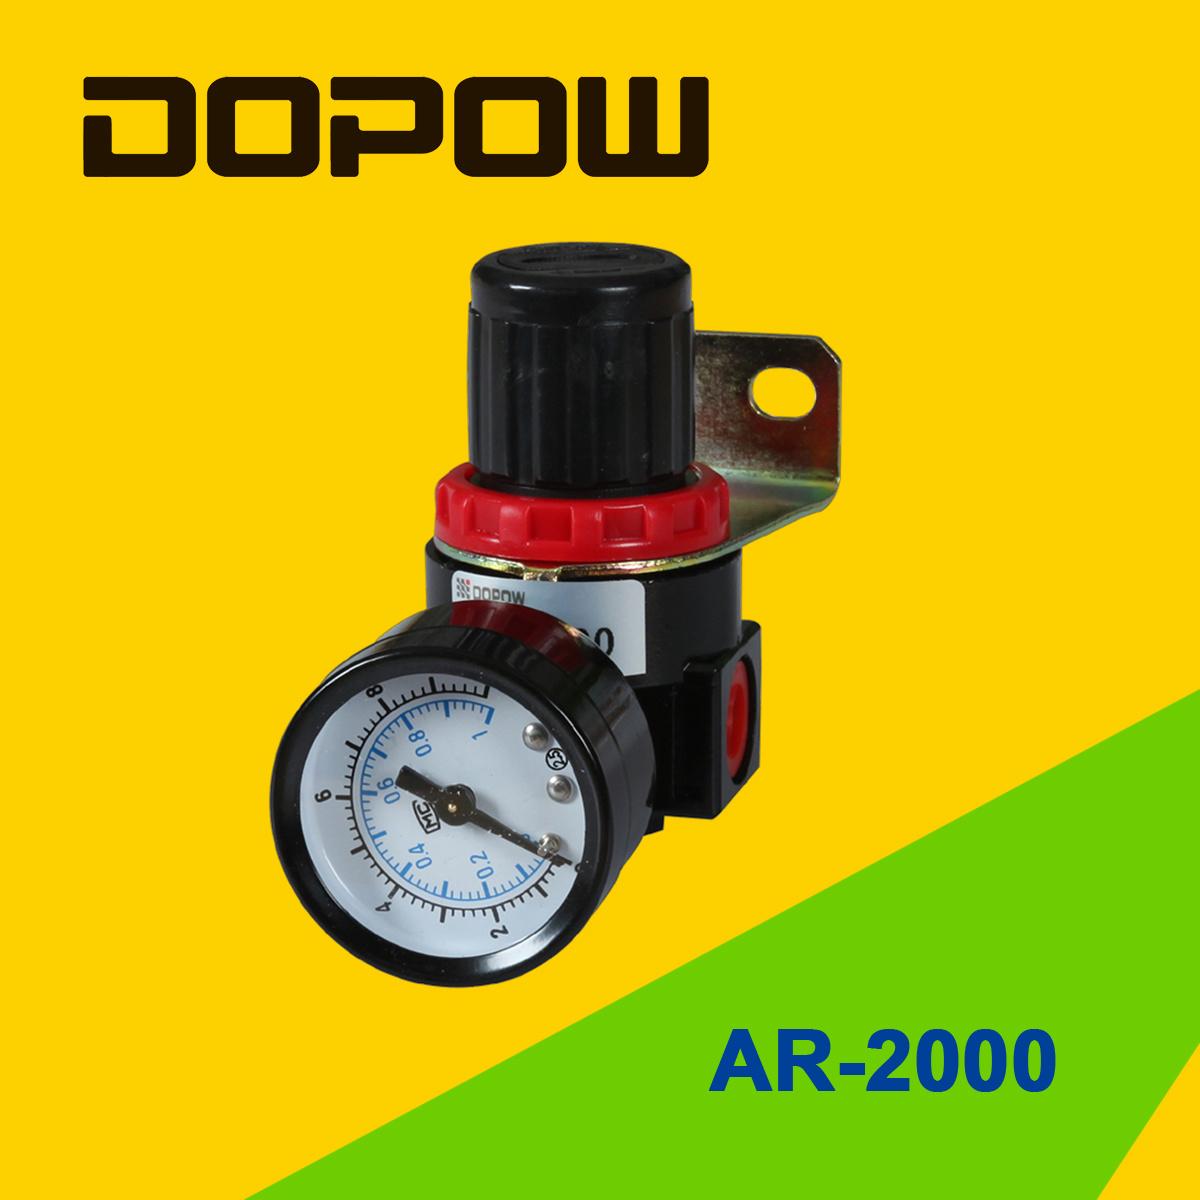 "Dopow Ar Br2000 Air Regulator with Gauge Bracket G1/8"""